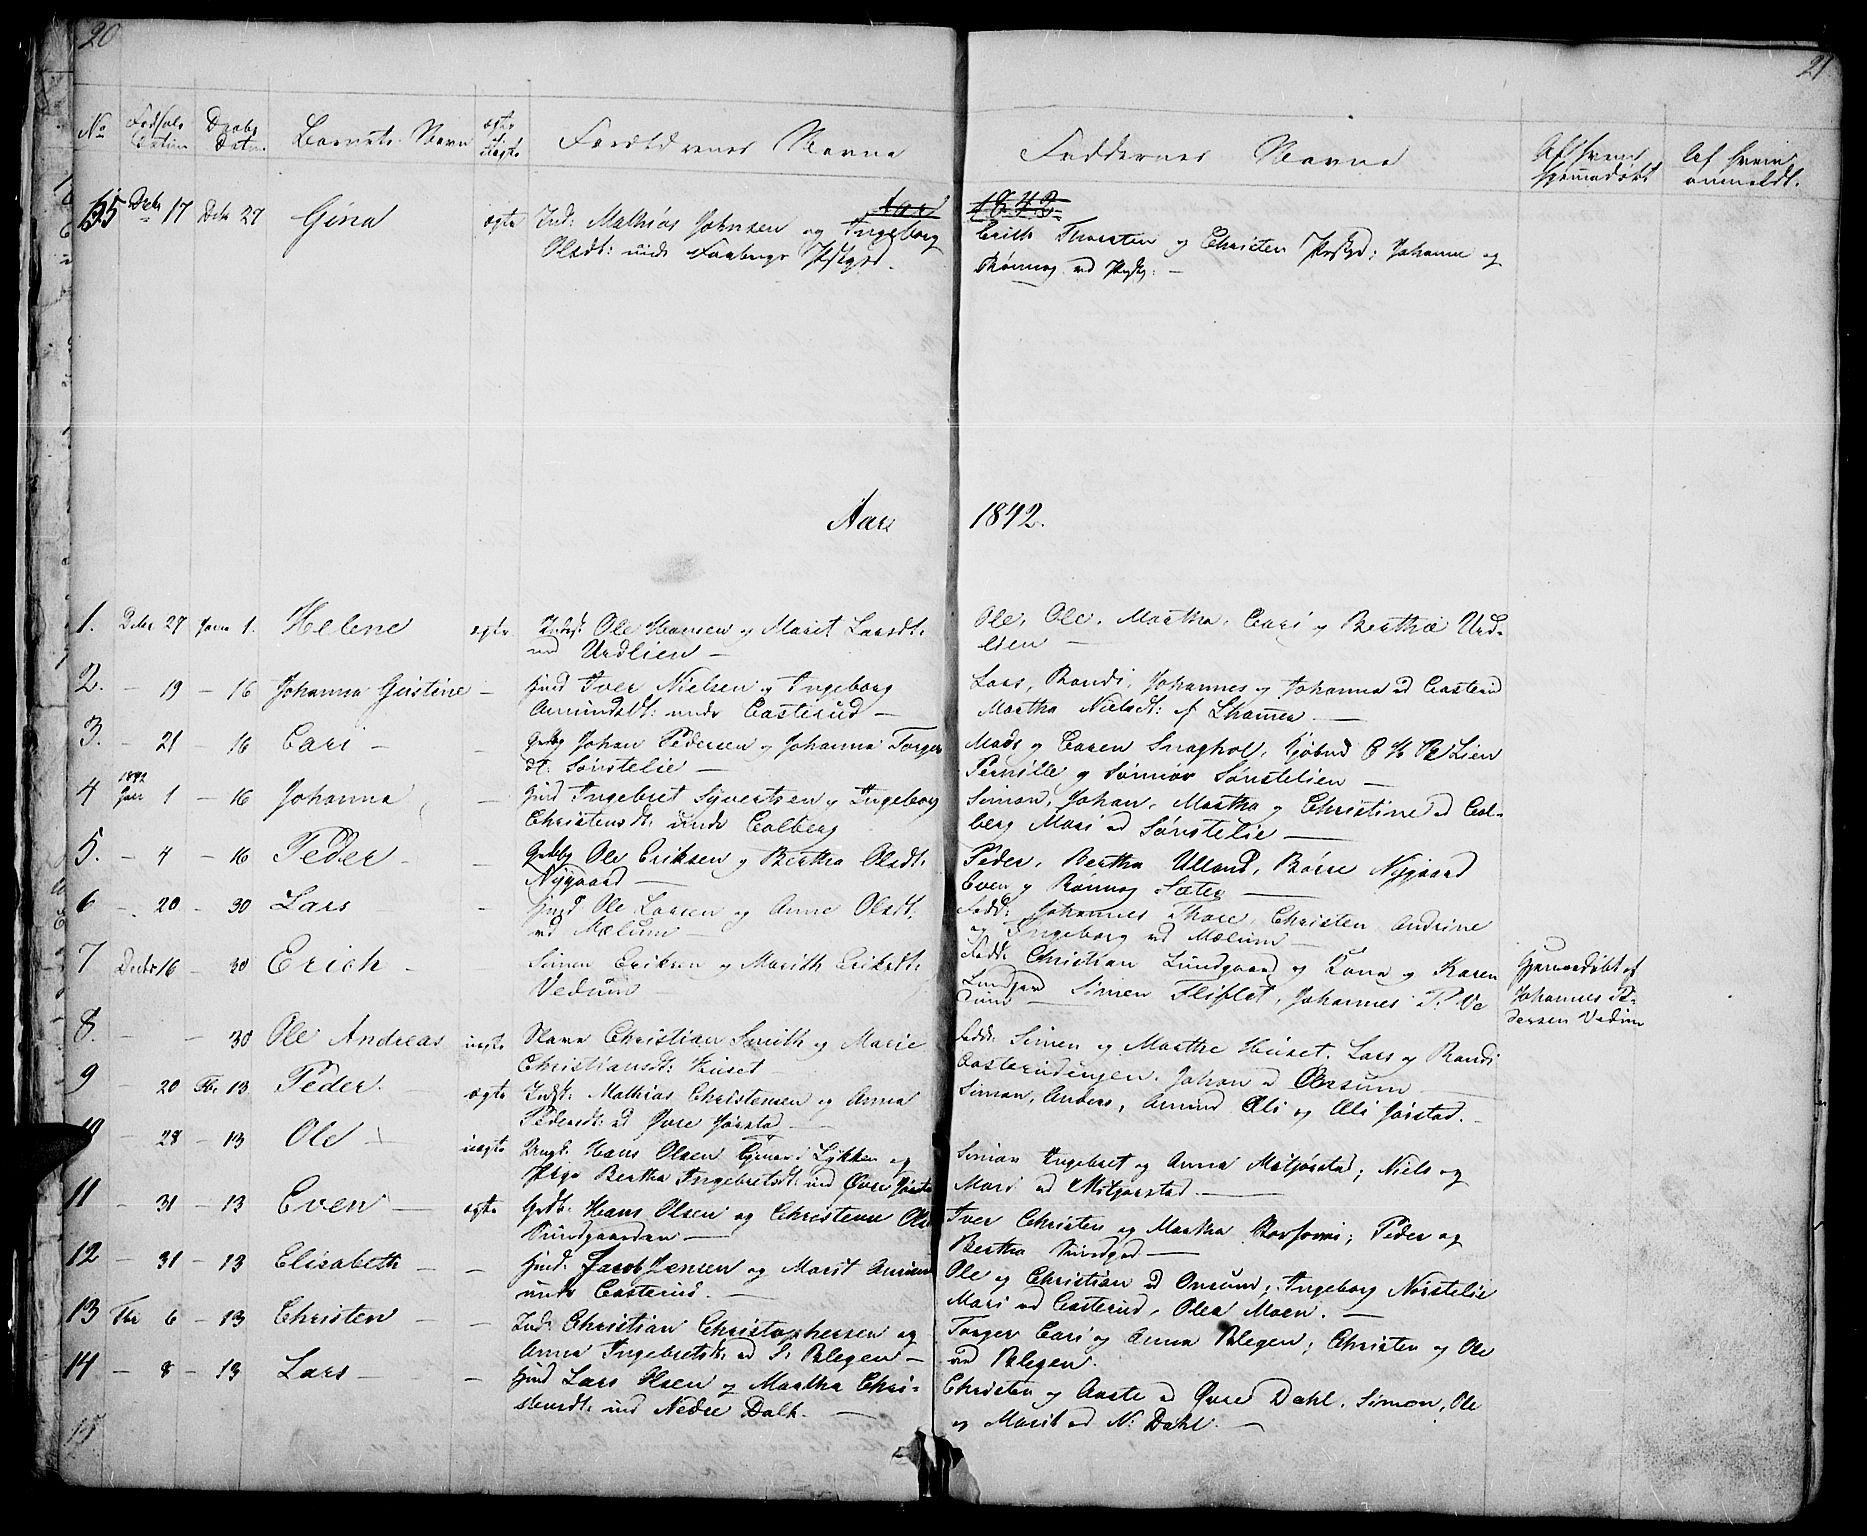 SAH, Fåberg prestekontor, Klokkerbok nr. 5, 1837-1864, s. 20-21